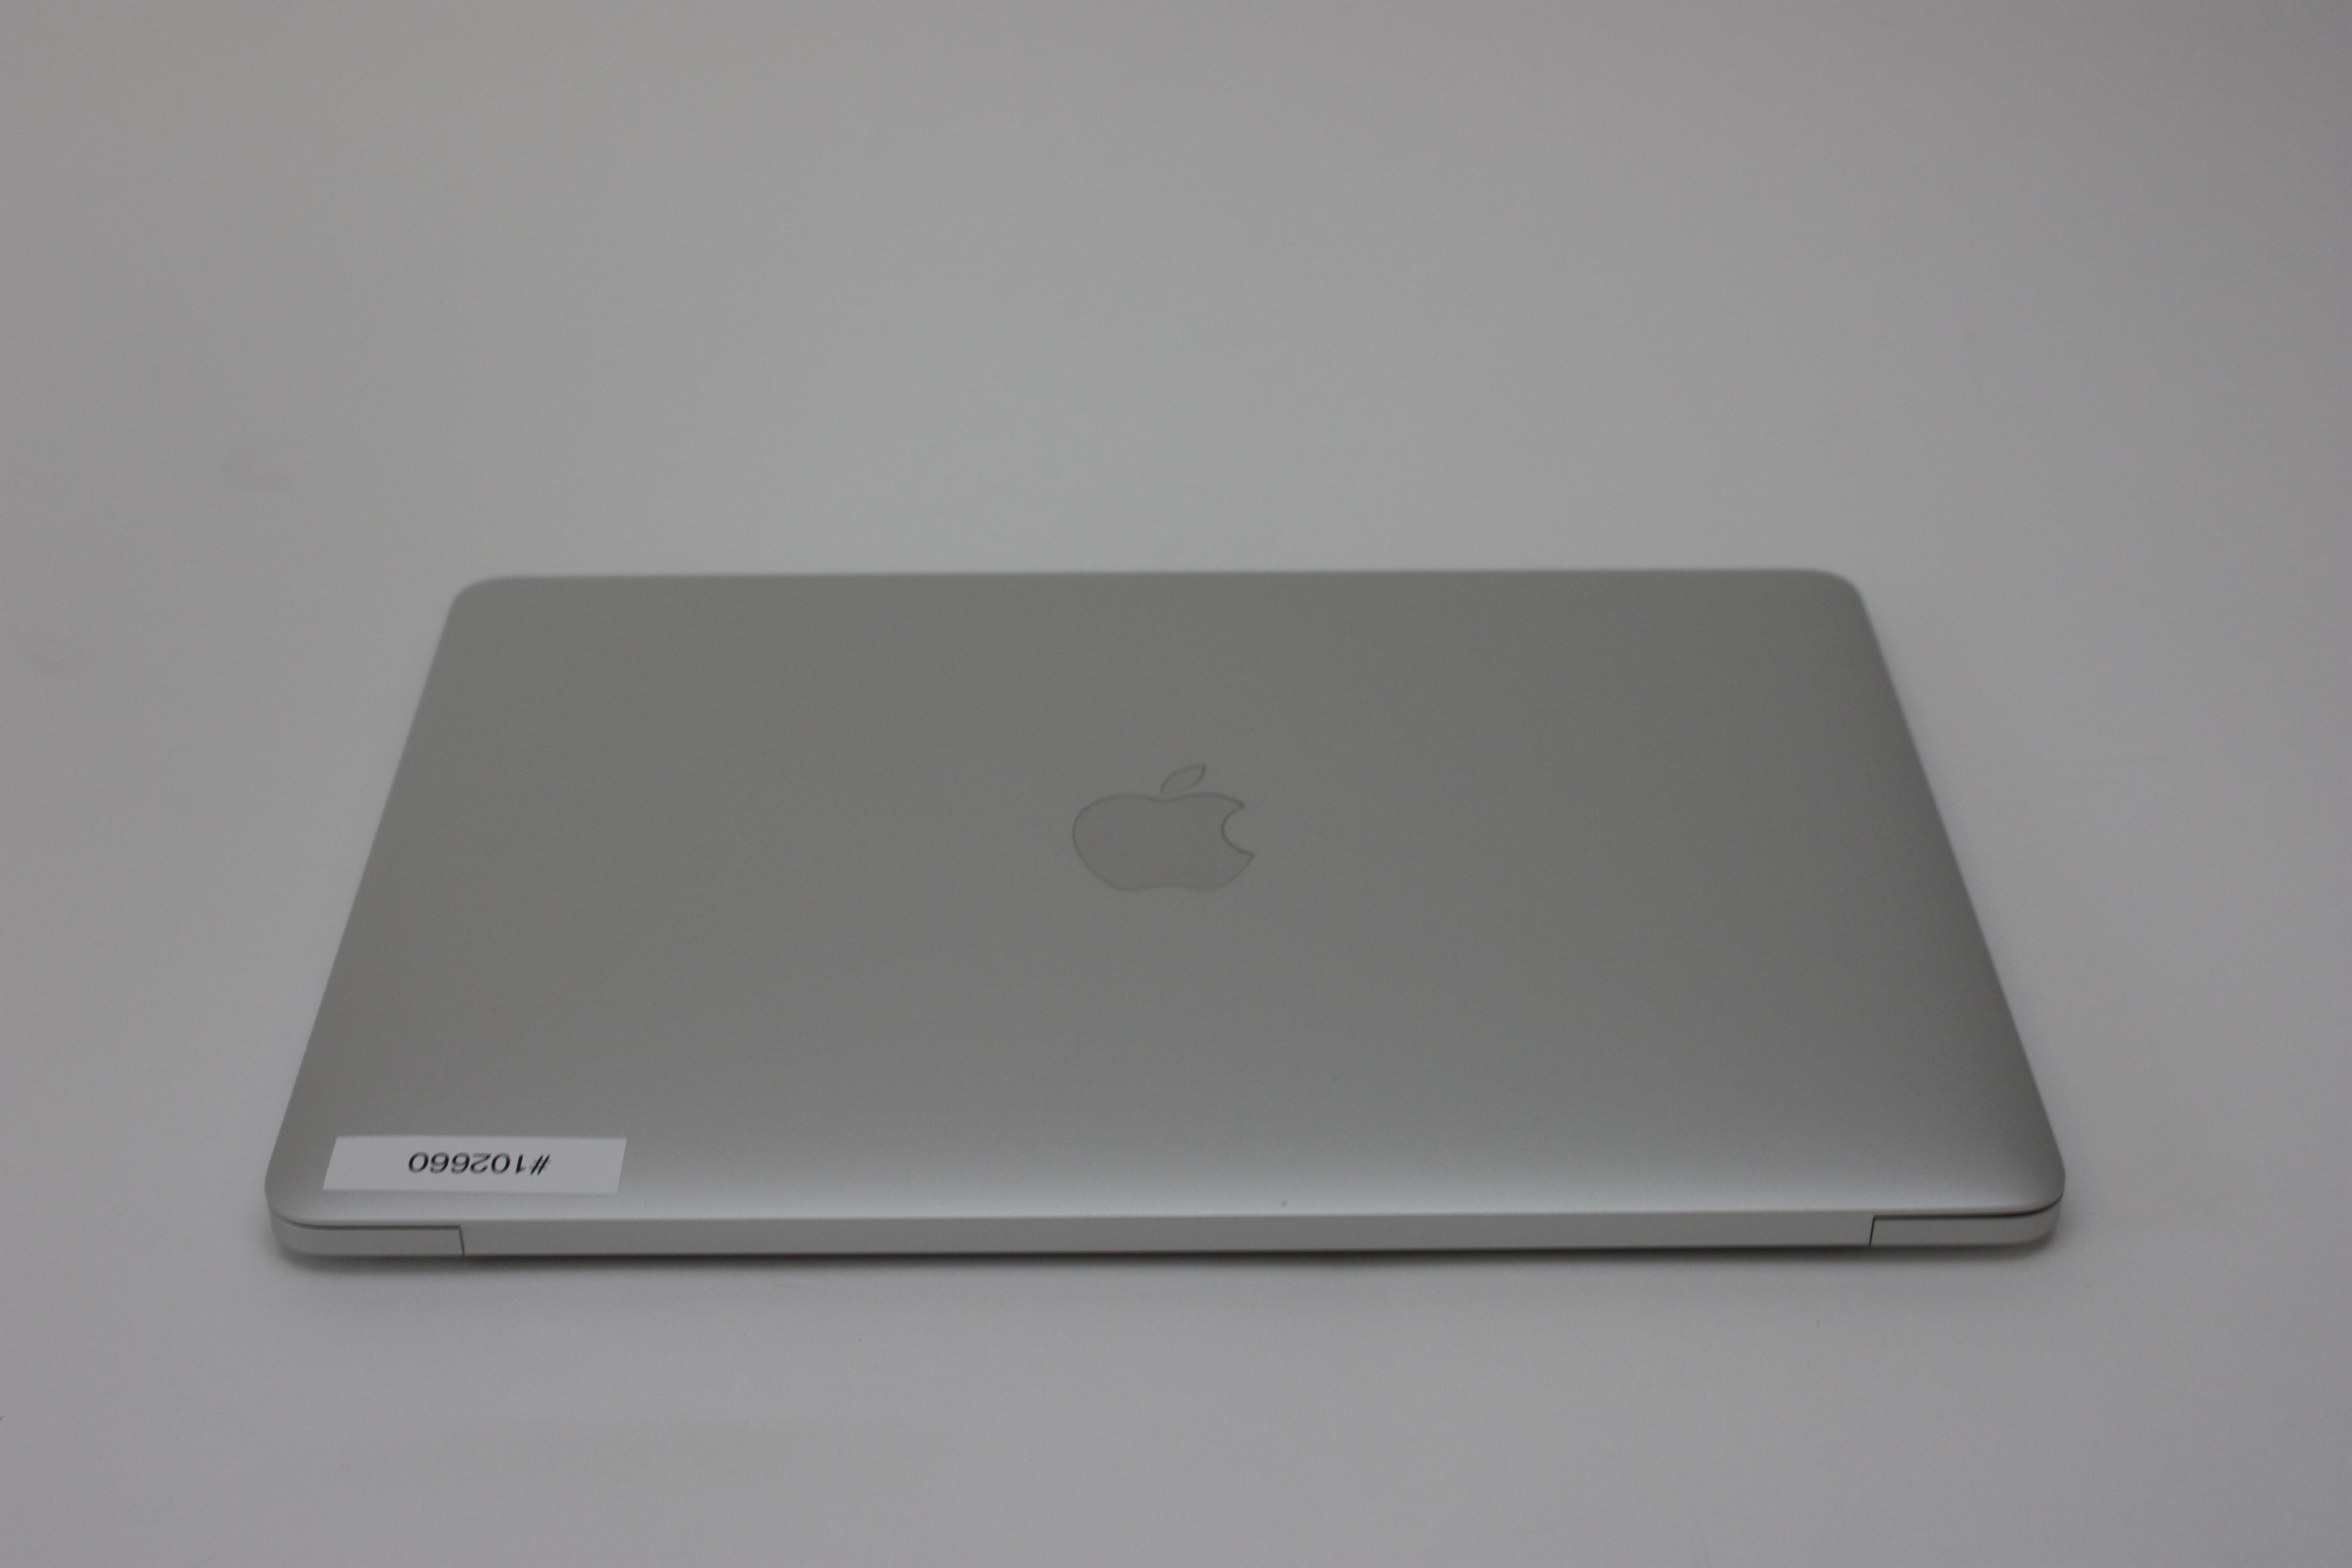 MacBook 12-inch Retina, 1.2 GHz Intel Core M, 8 GB 1600 MHz DDR3, 500 GB Flash Storage, image 6